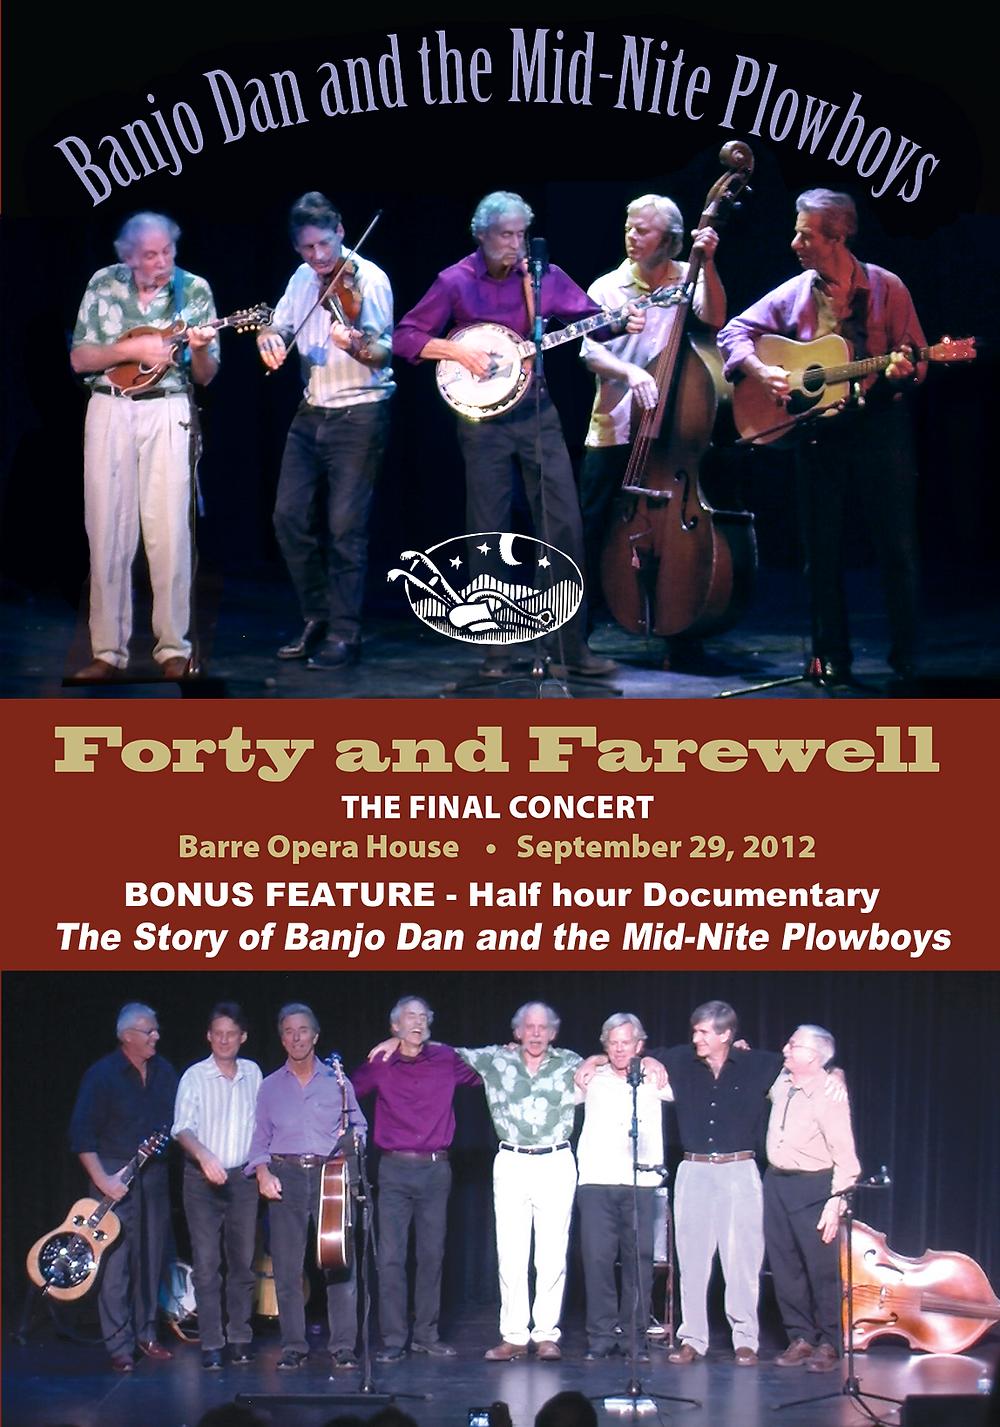 Banjo Dan and the Mid-Nite Plowboys documentary